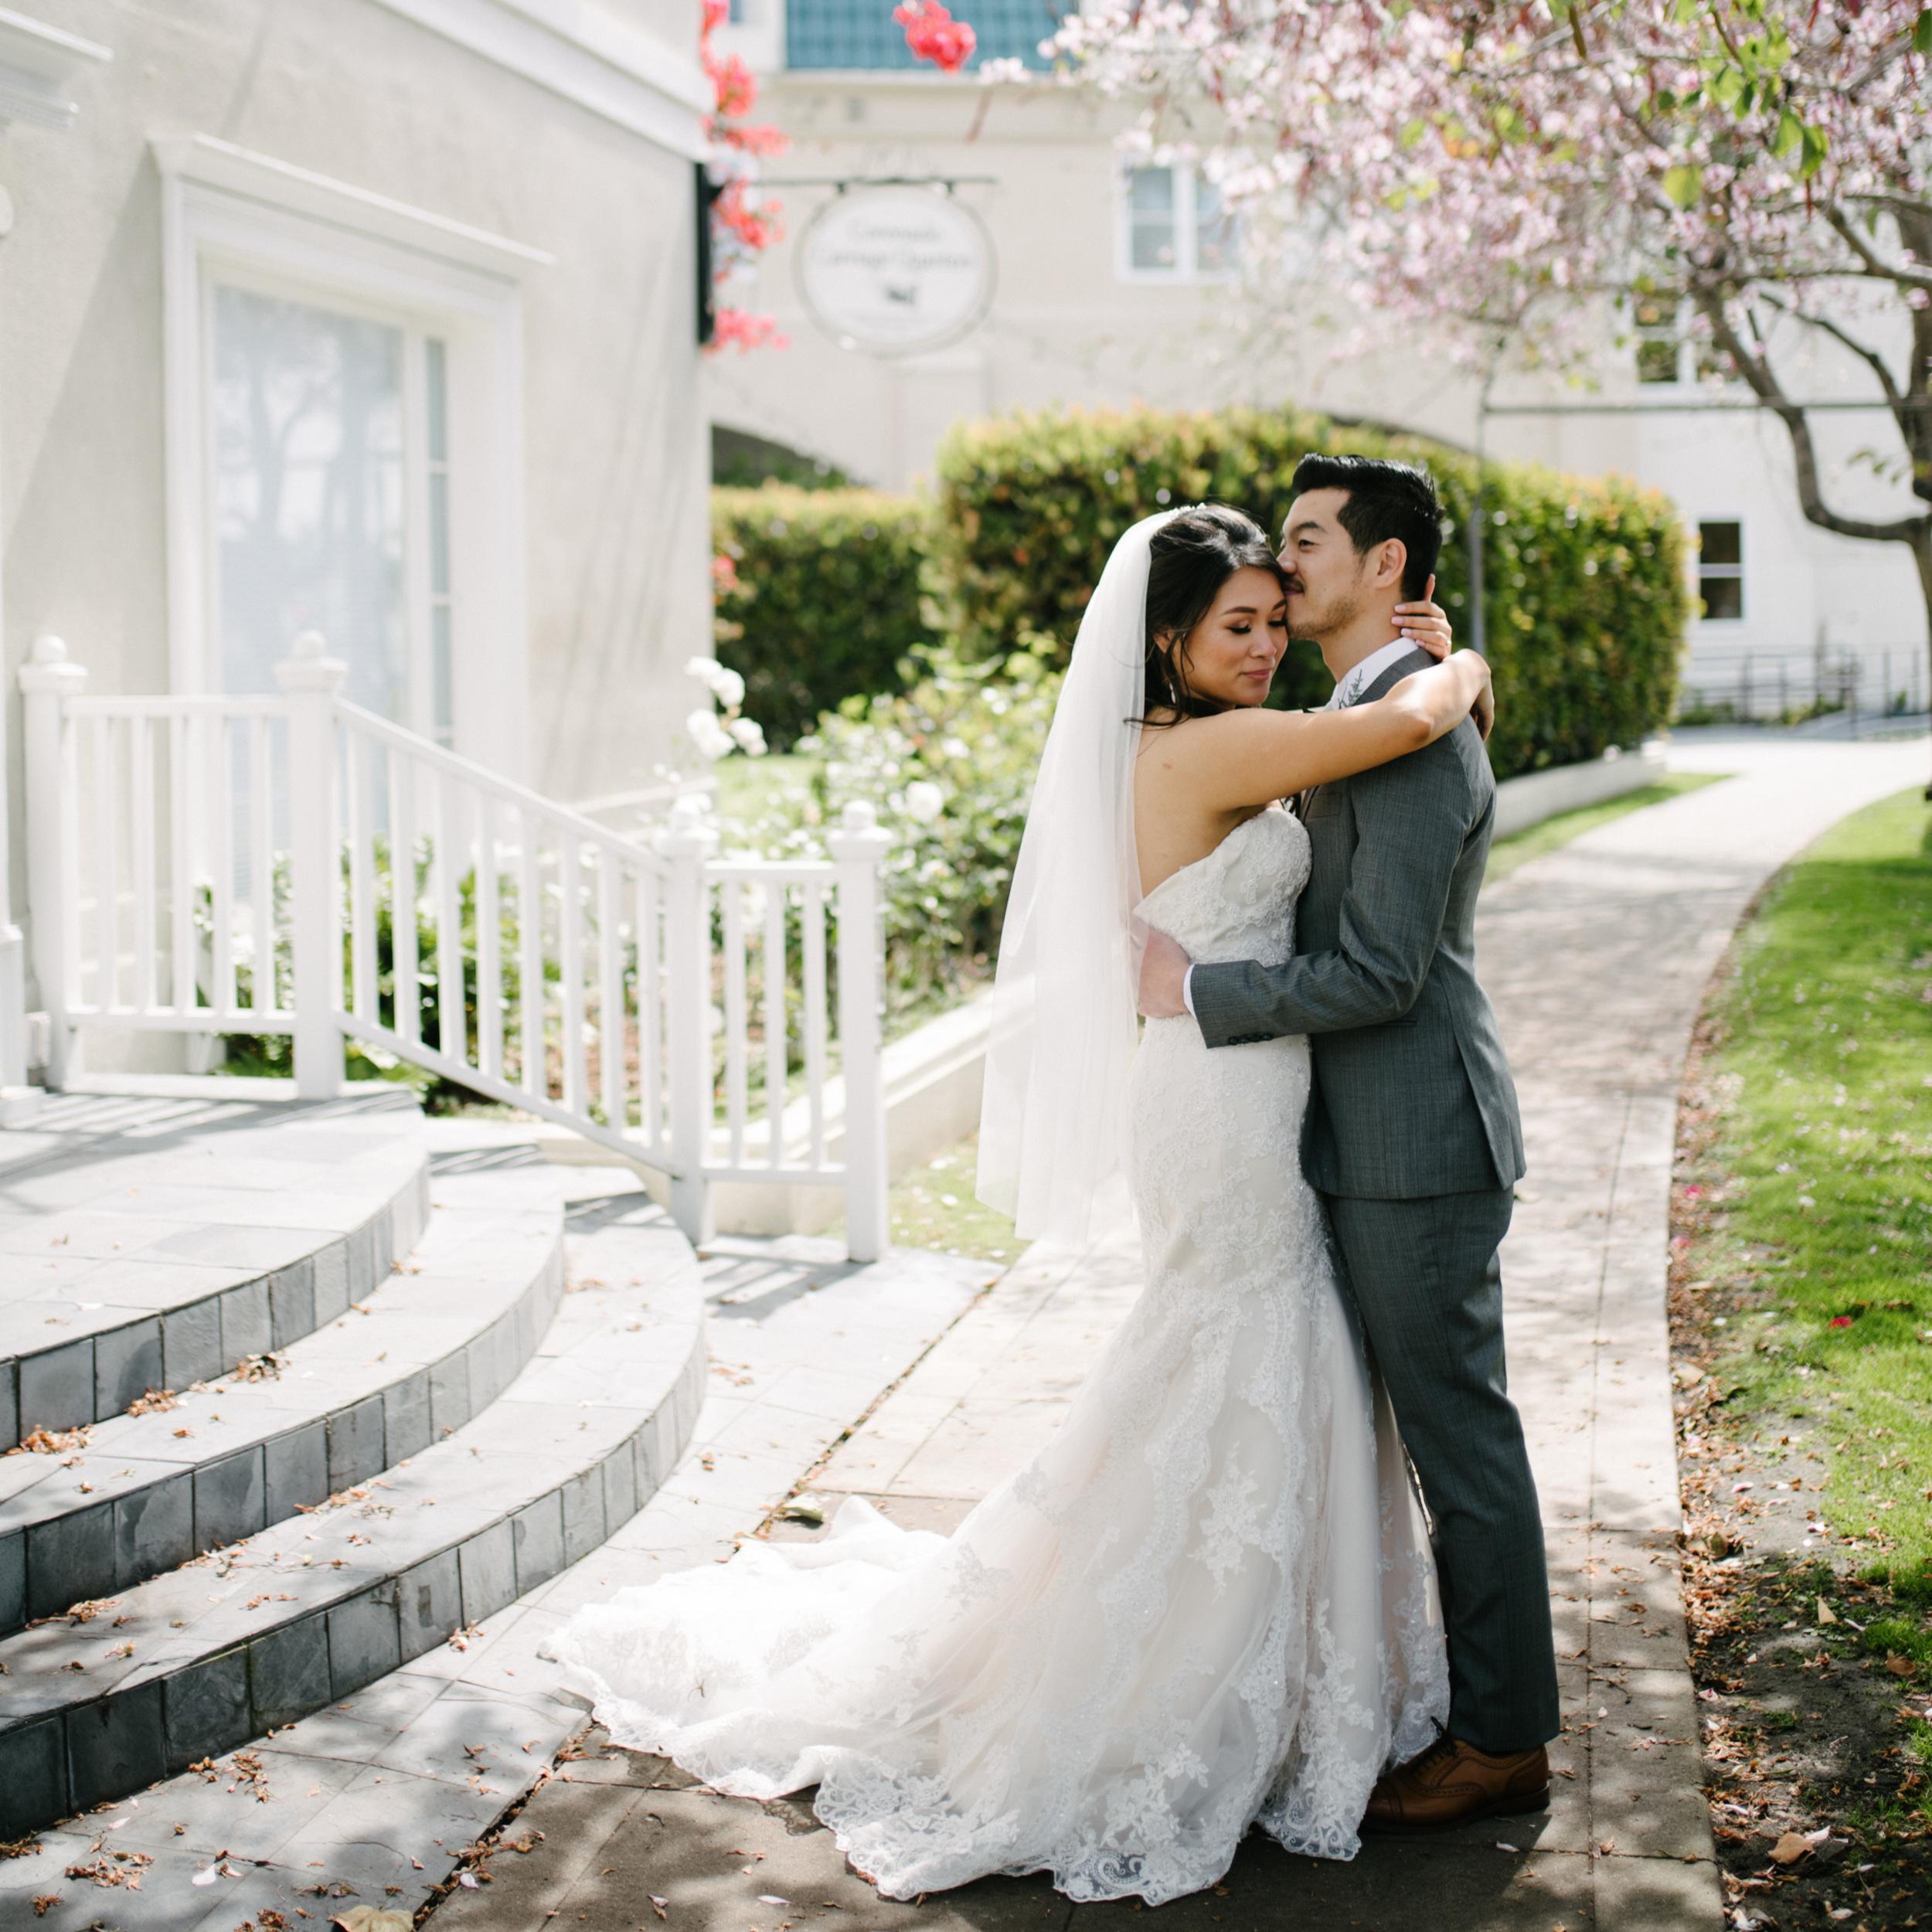 wedding_coronado_community_center-14.jpg